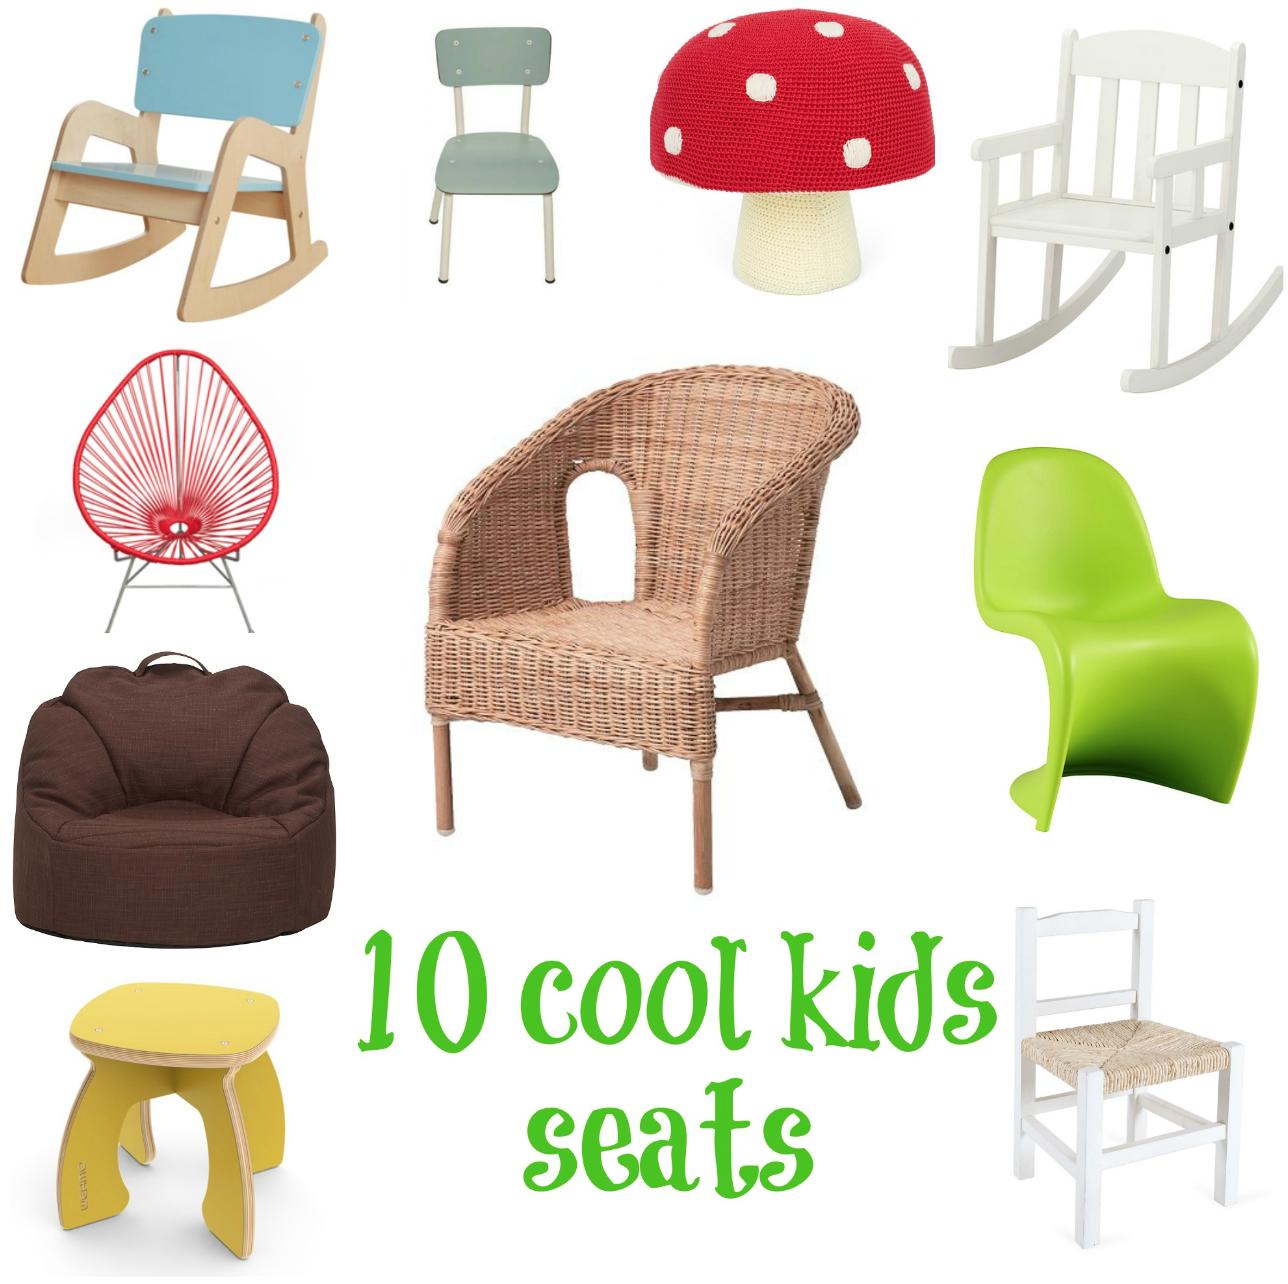 nursery furniture from argos | ethan allen sofas prices